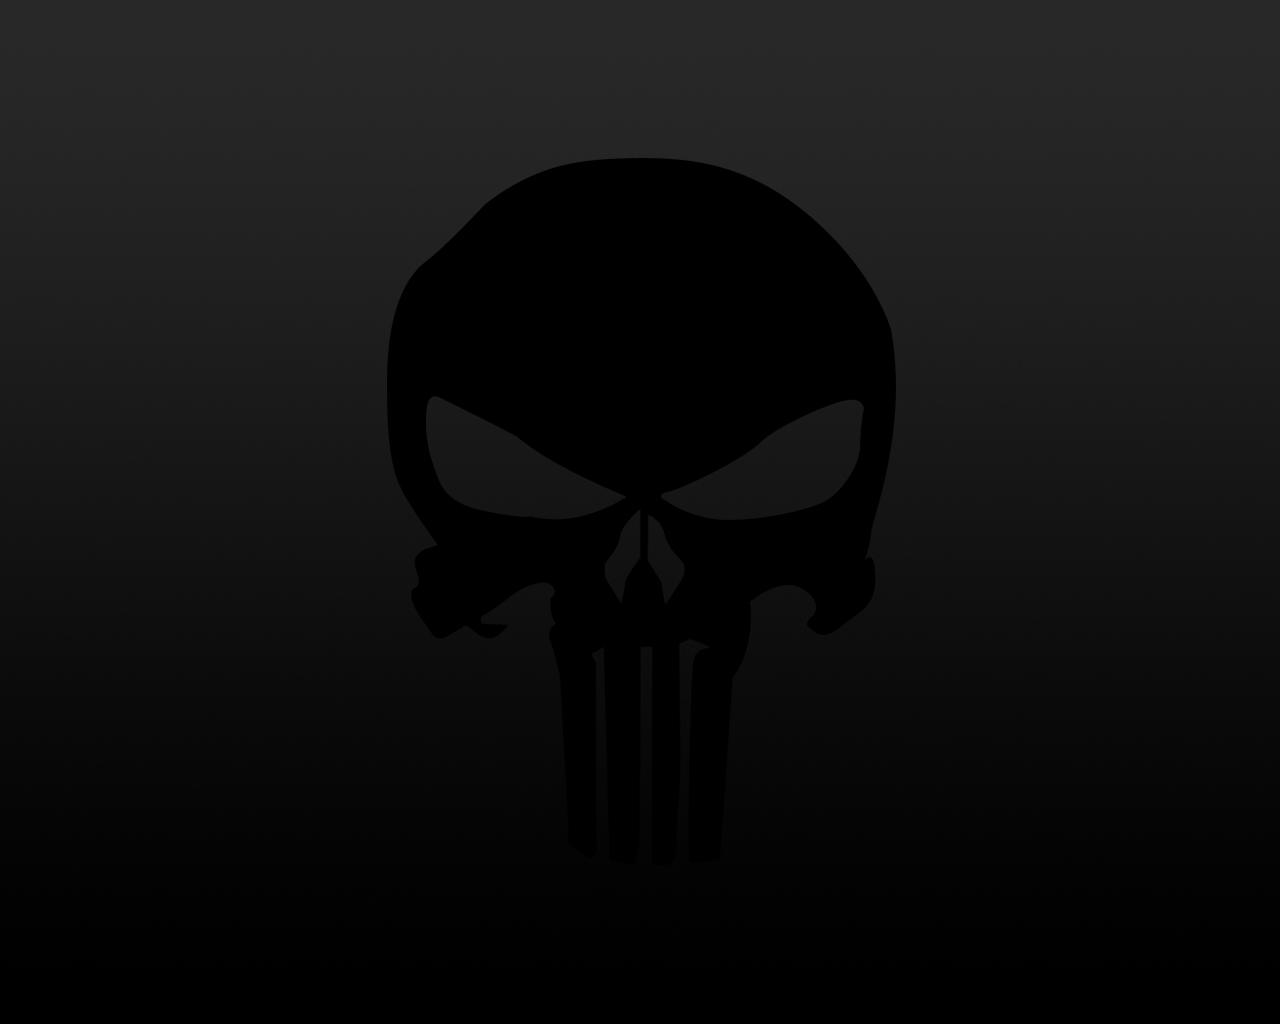 The Punisher Skull Iphone Wallpaper Idesign Iphone